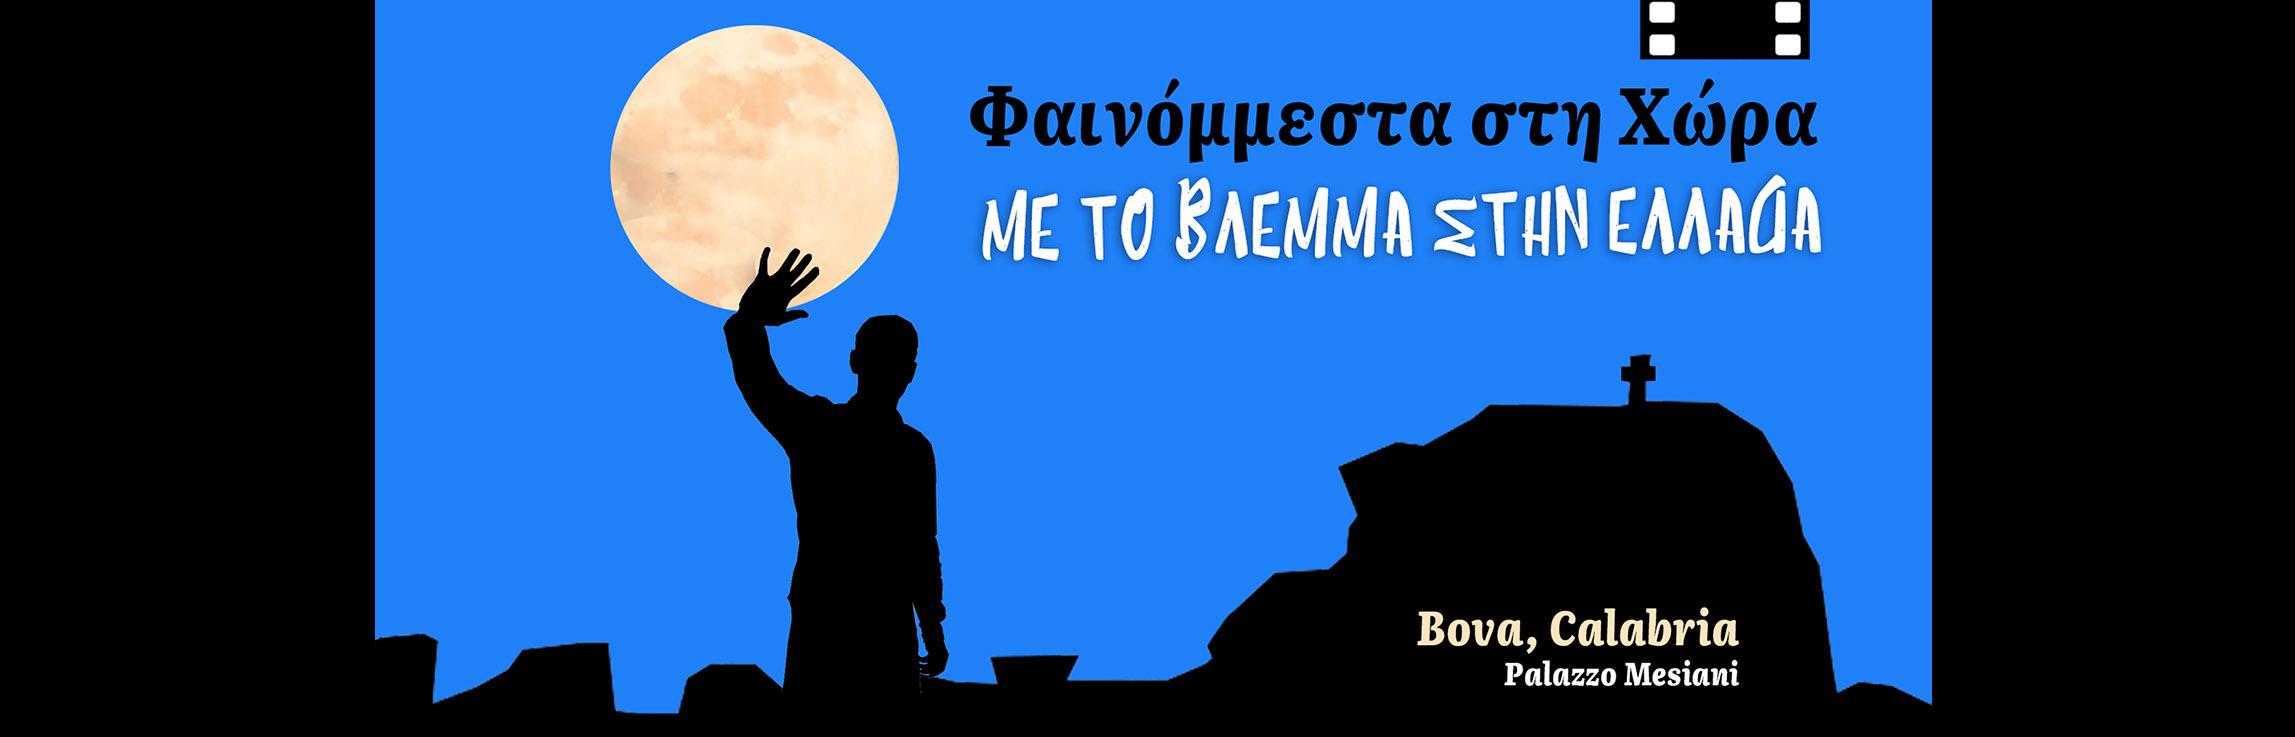 Cinema greco a Bova - Nyfes (Spose) di P. Voulgaris